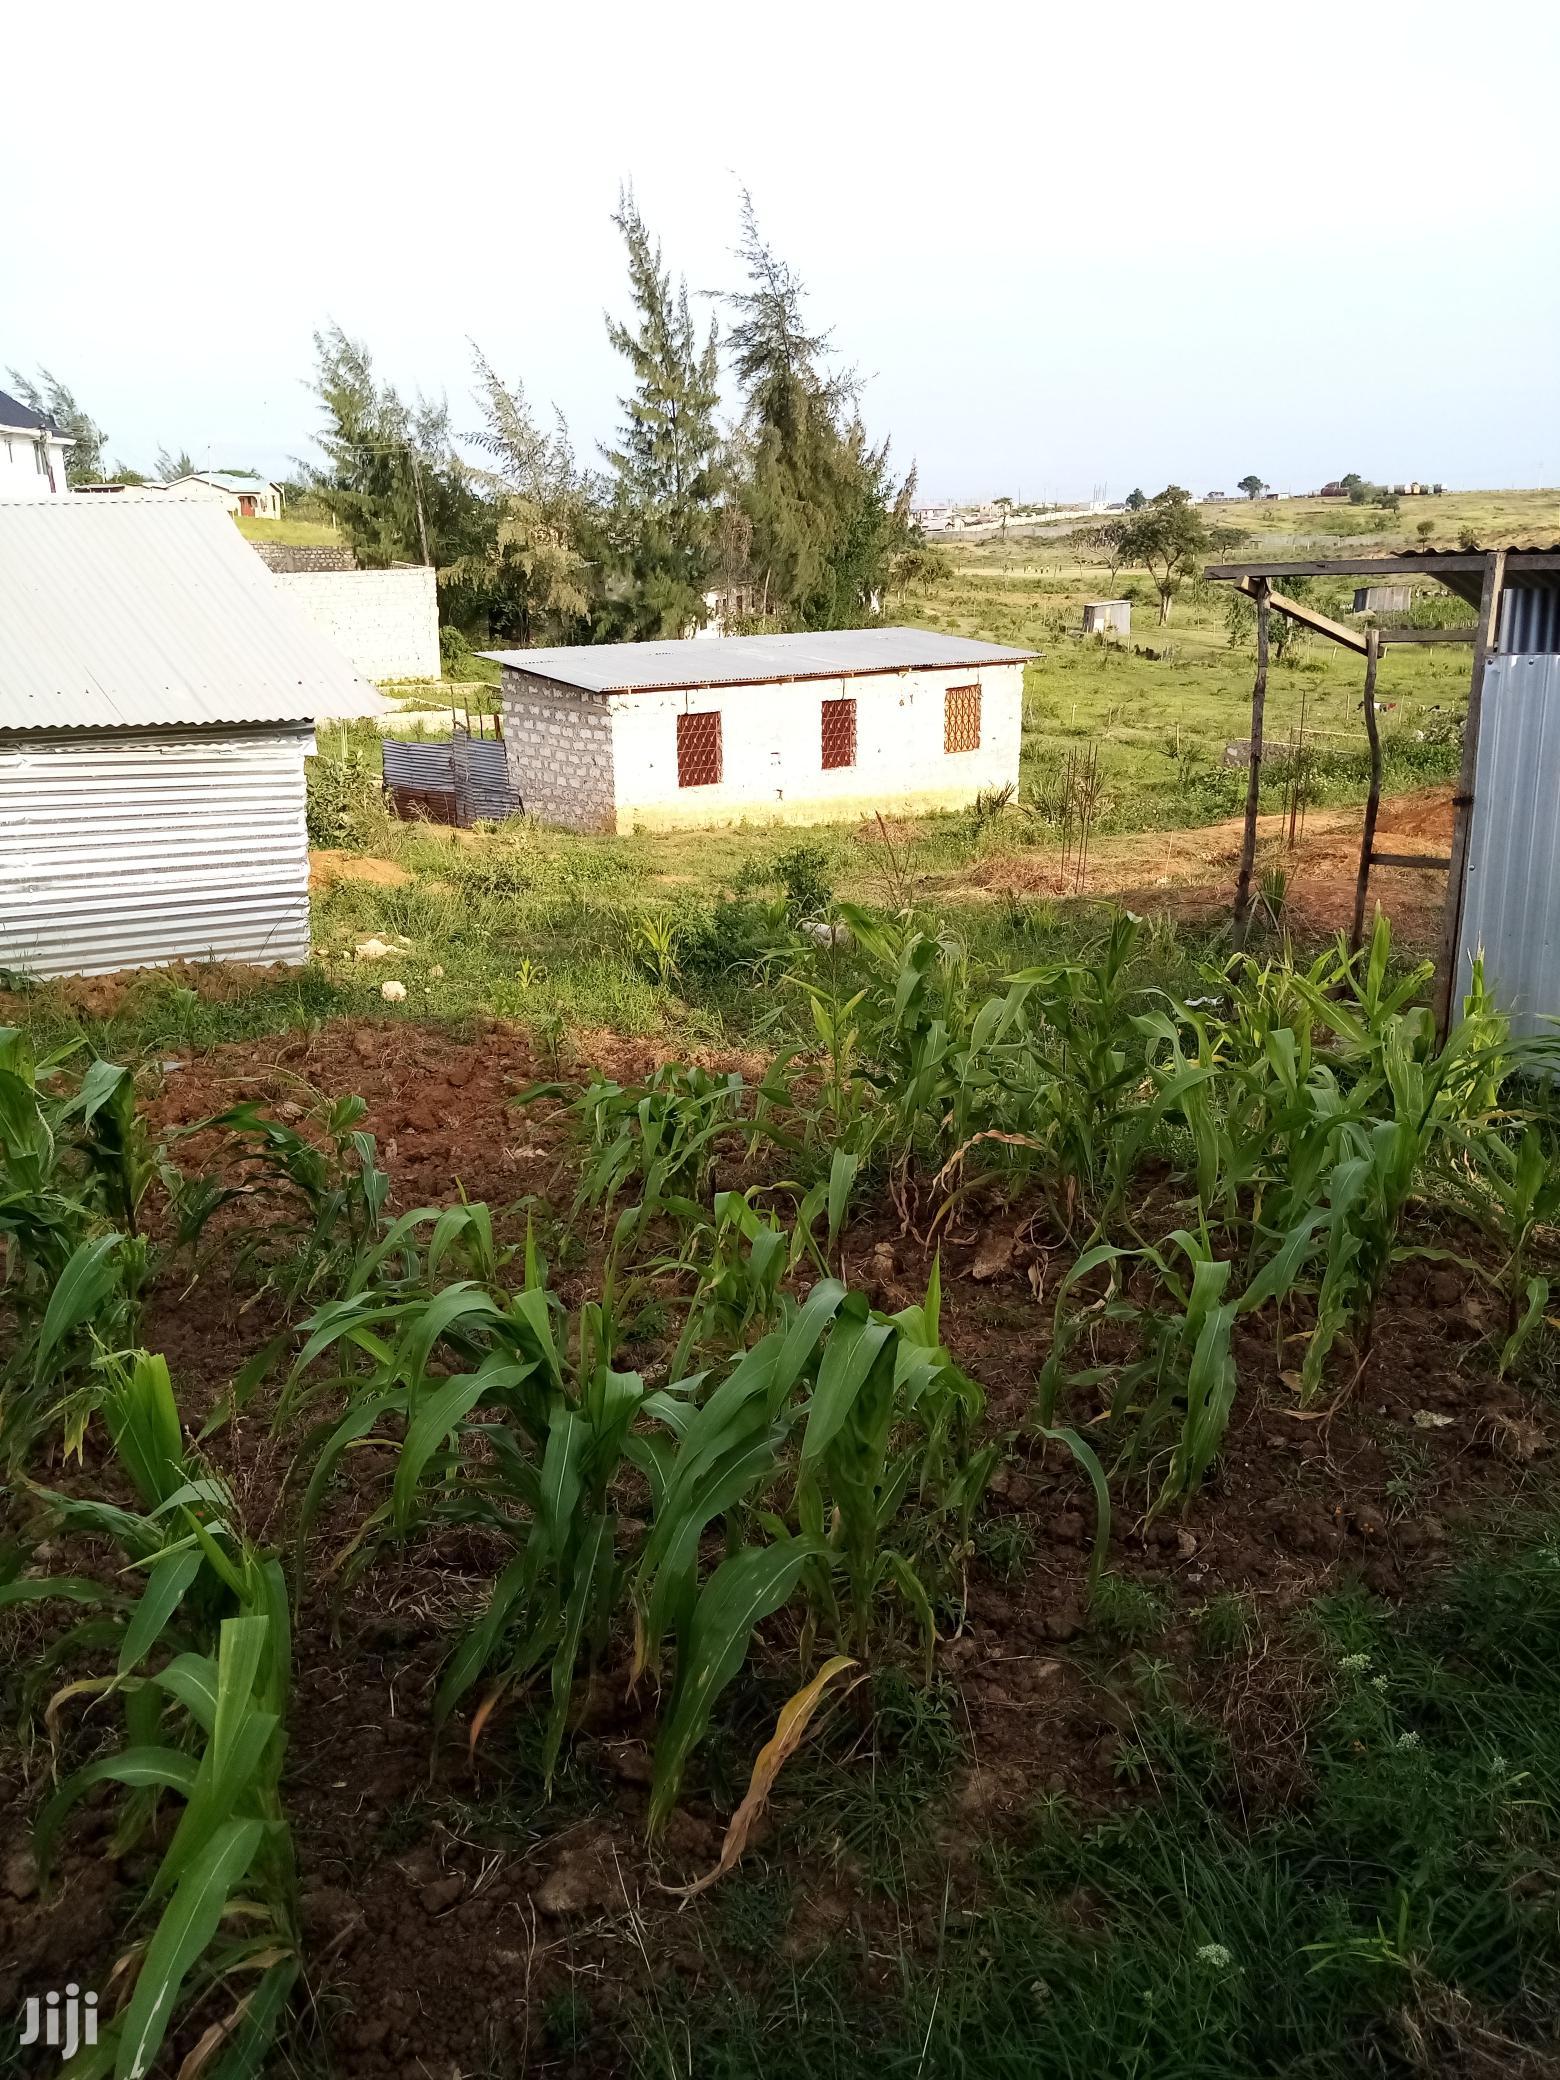 Plot for Sale | Land & Plots For Sale for sale in Kisauni, Mombasa, Kenya